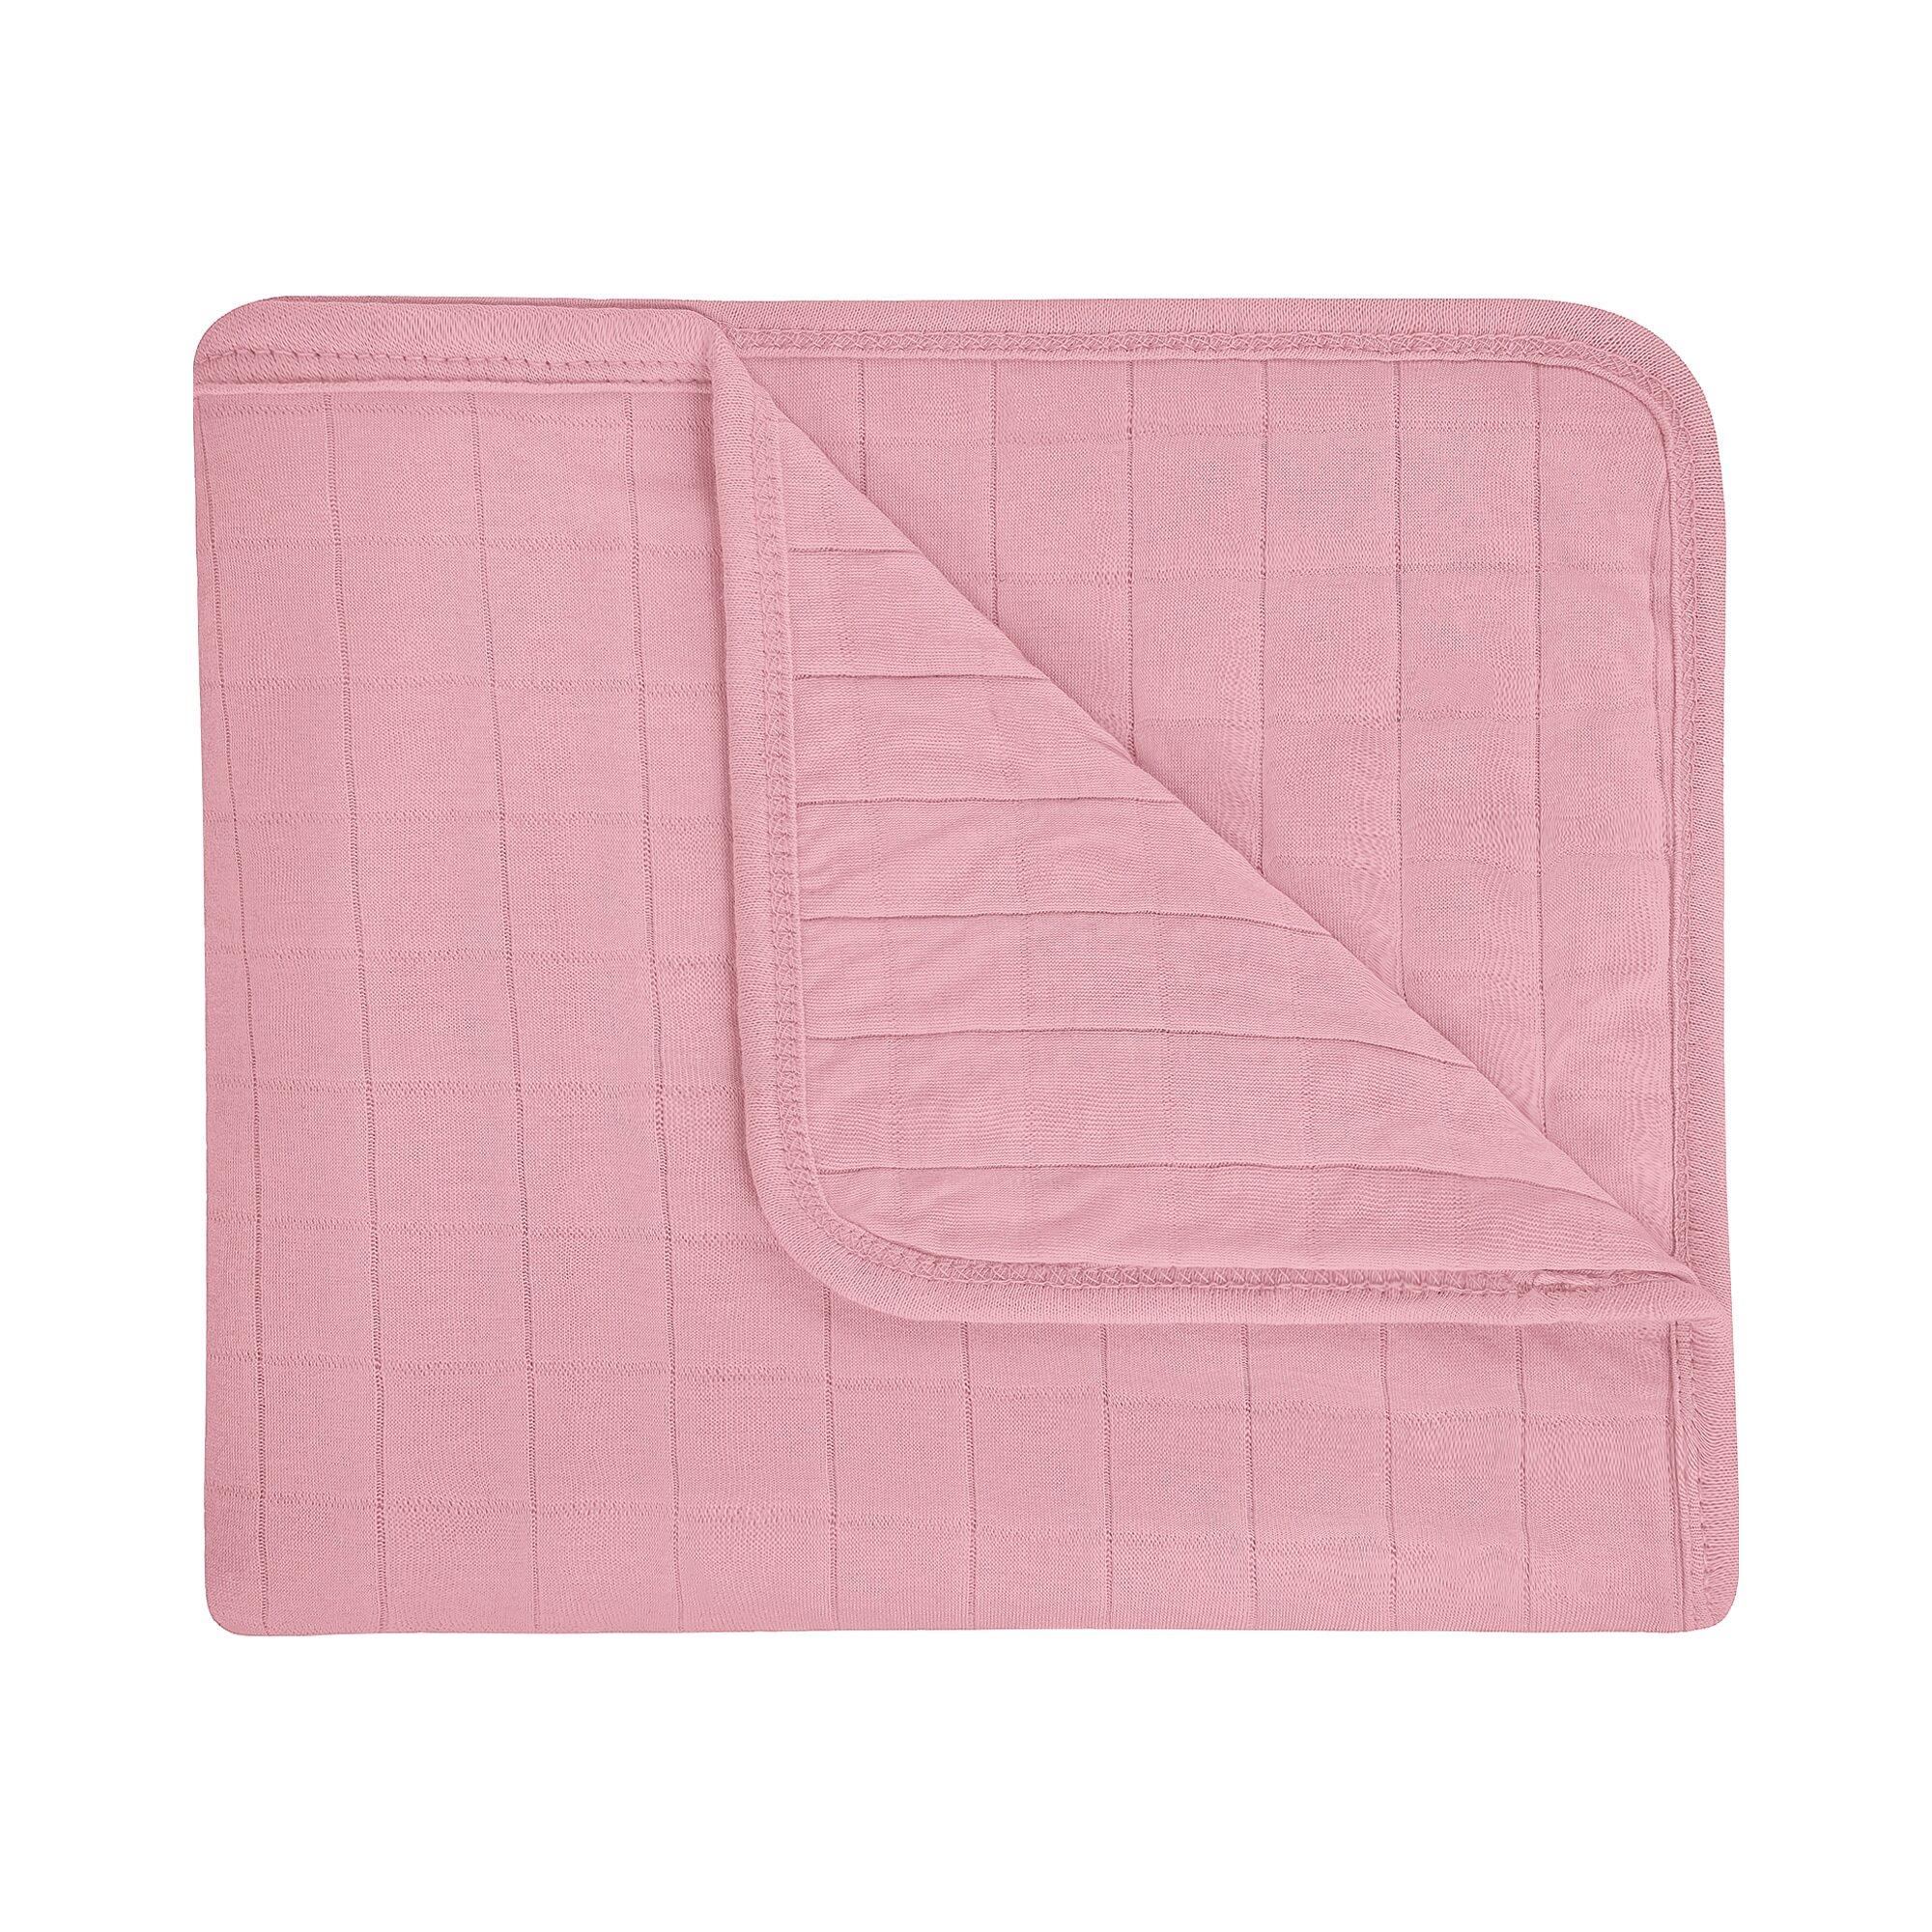 Julius Zöllner Babydecke Doppeljersey Premium 100x120 cm rosa